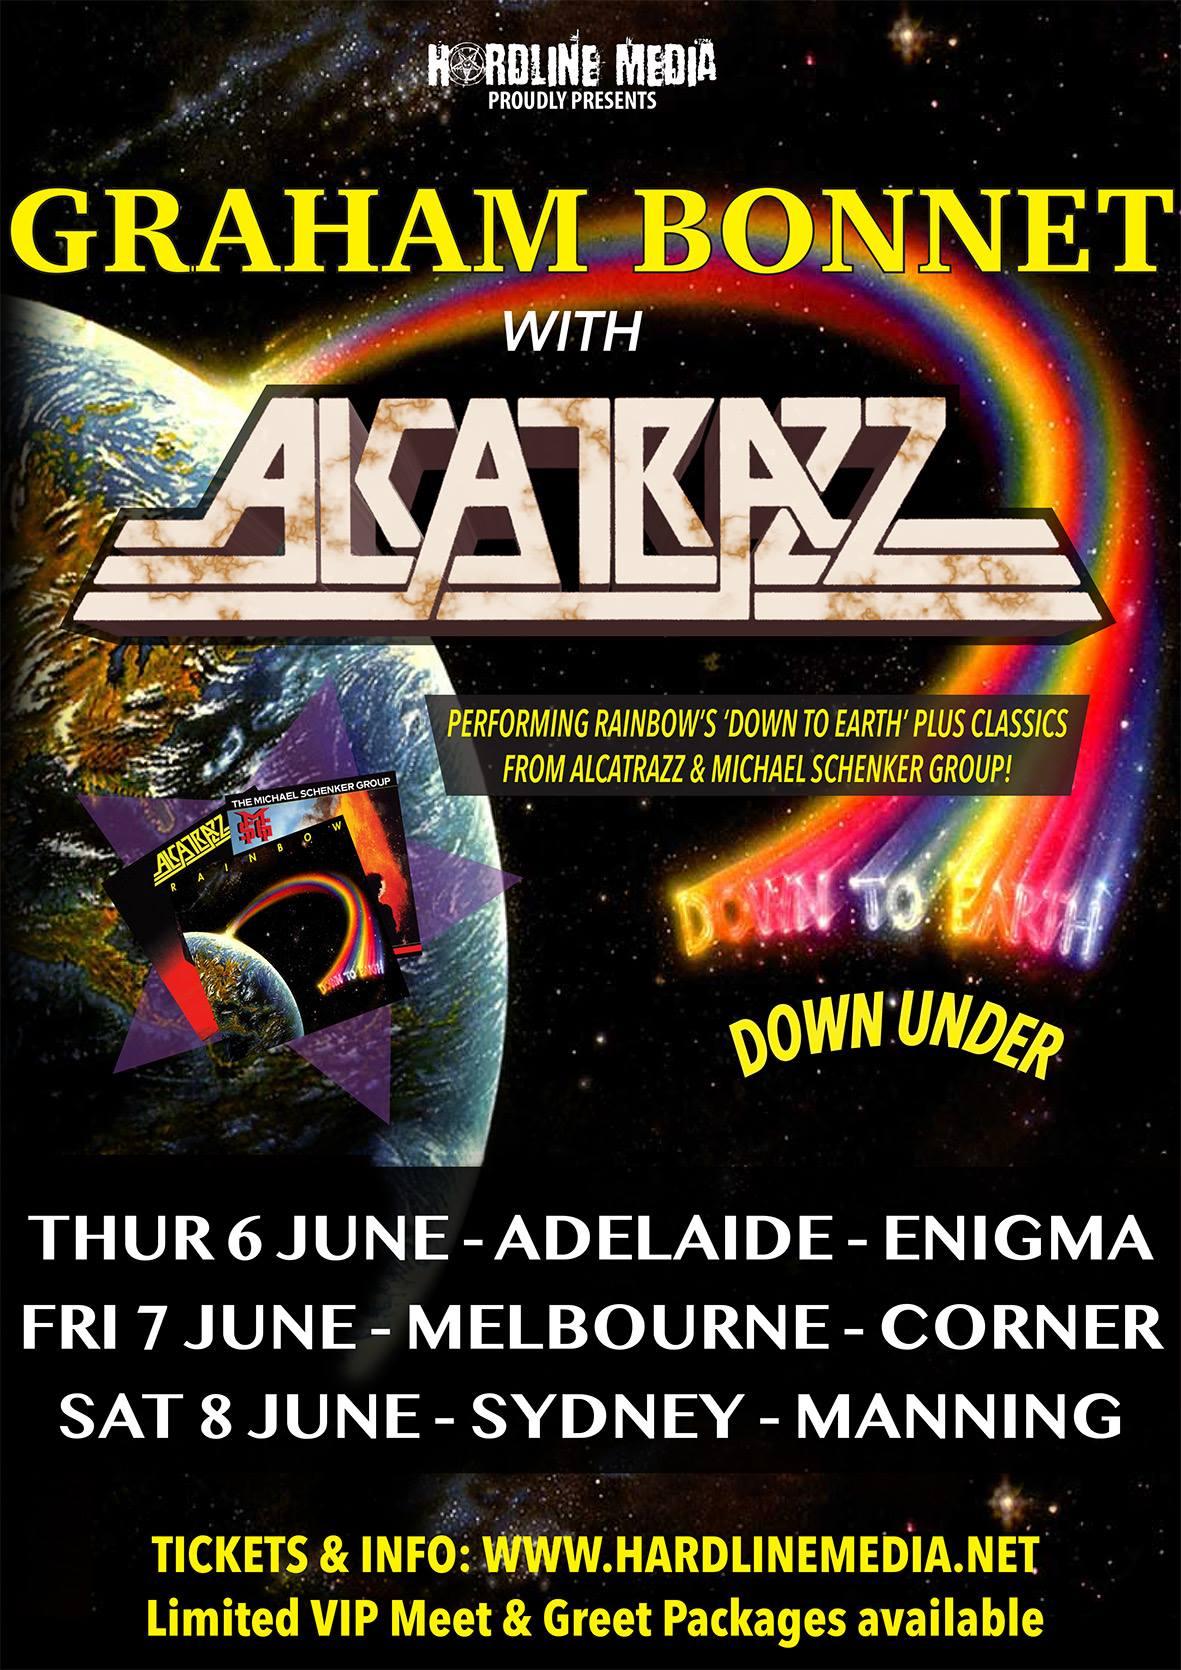 Image of GRAHAM BONNET with ALCATRAZZ - Aussie Tour Poster 2019